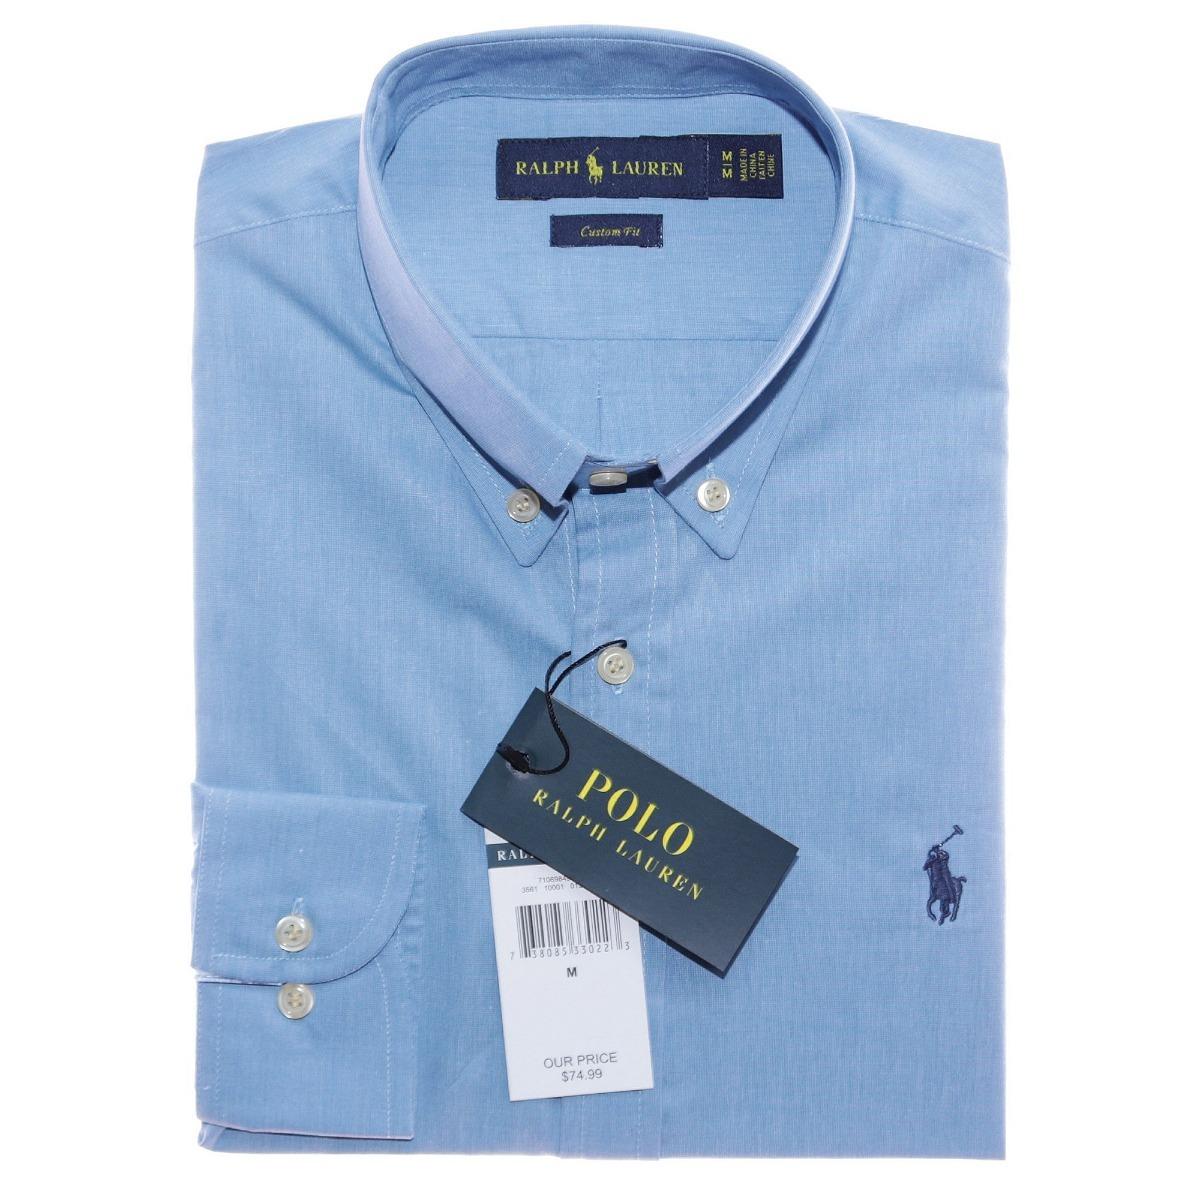 camisa social ralph lauren masc azul aço custom fit original. Carregando  zoom. c91350fddbe